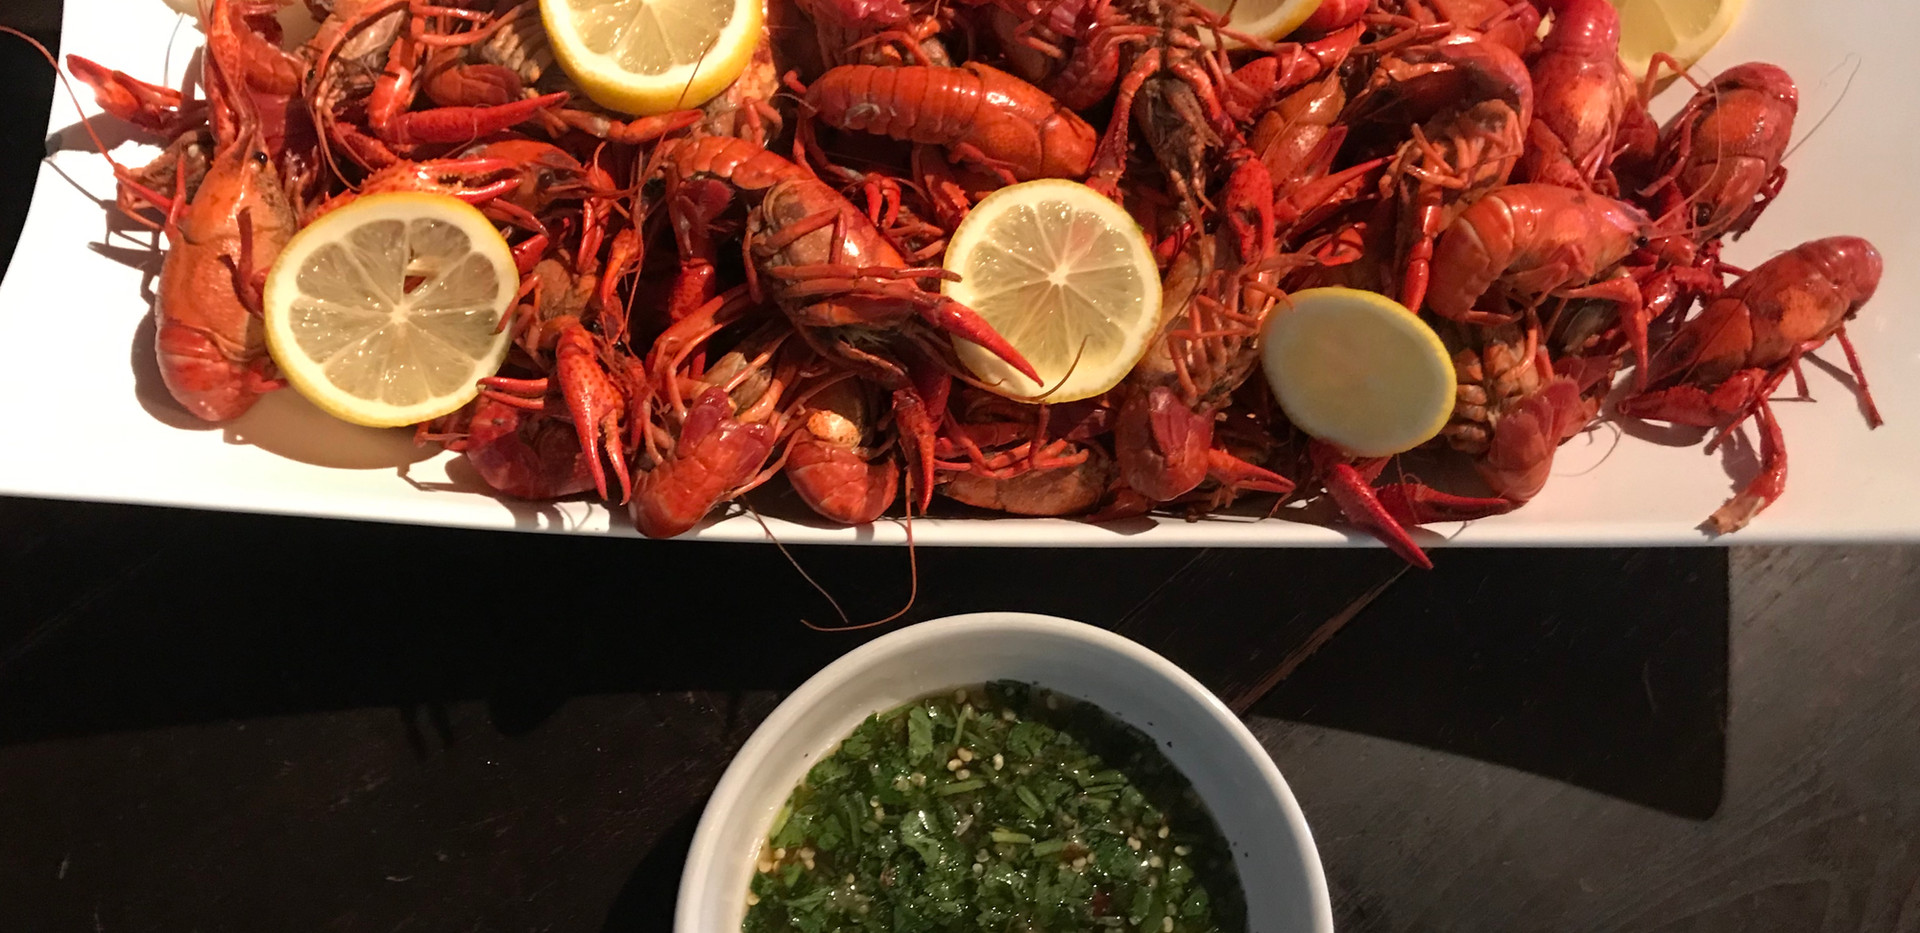 Live Crawfish Boil